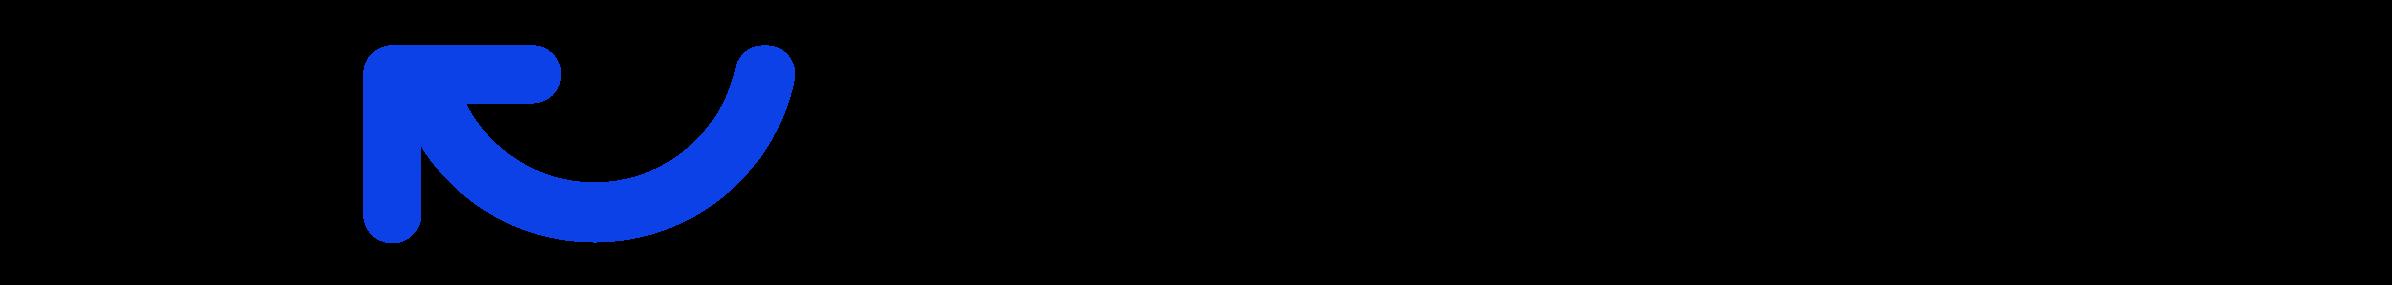 IWR-RGB-HORIZONTAL.png